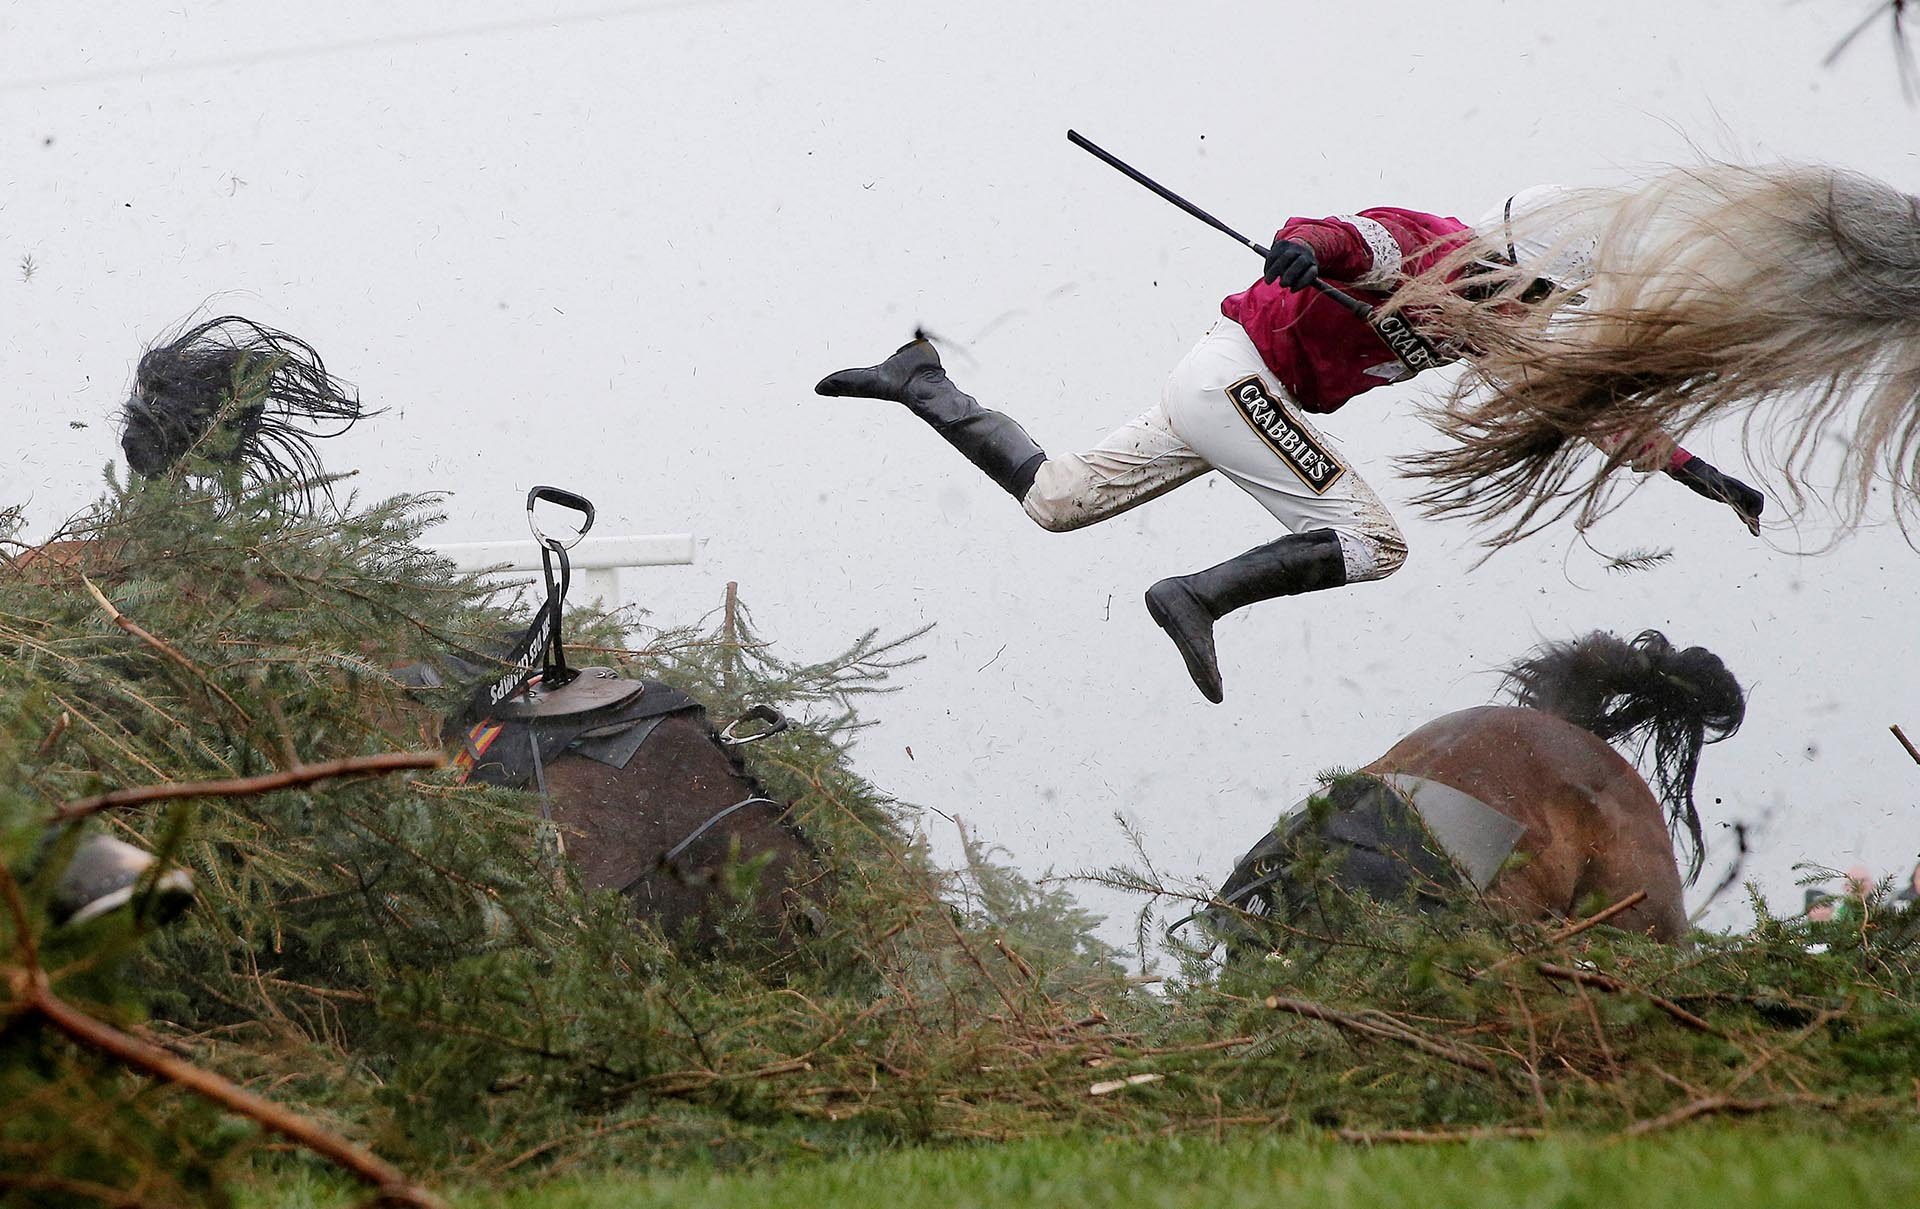 Deportes, primeros premios. Nina Carberry vuela de su caballo en Liverpool, Inglaterra. Tom Jenkins, The Guardian